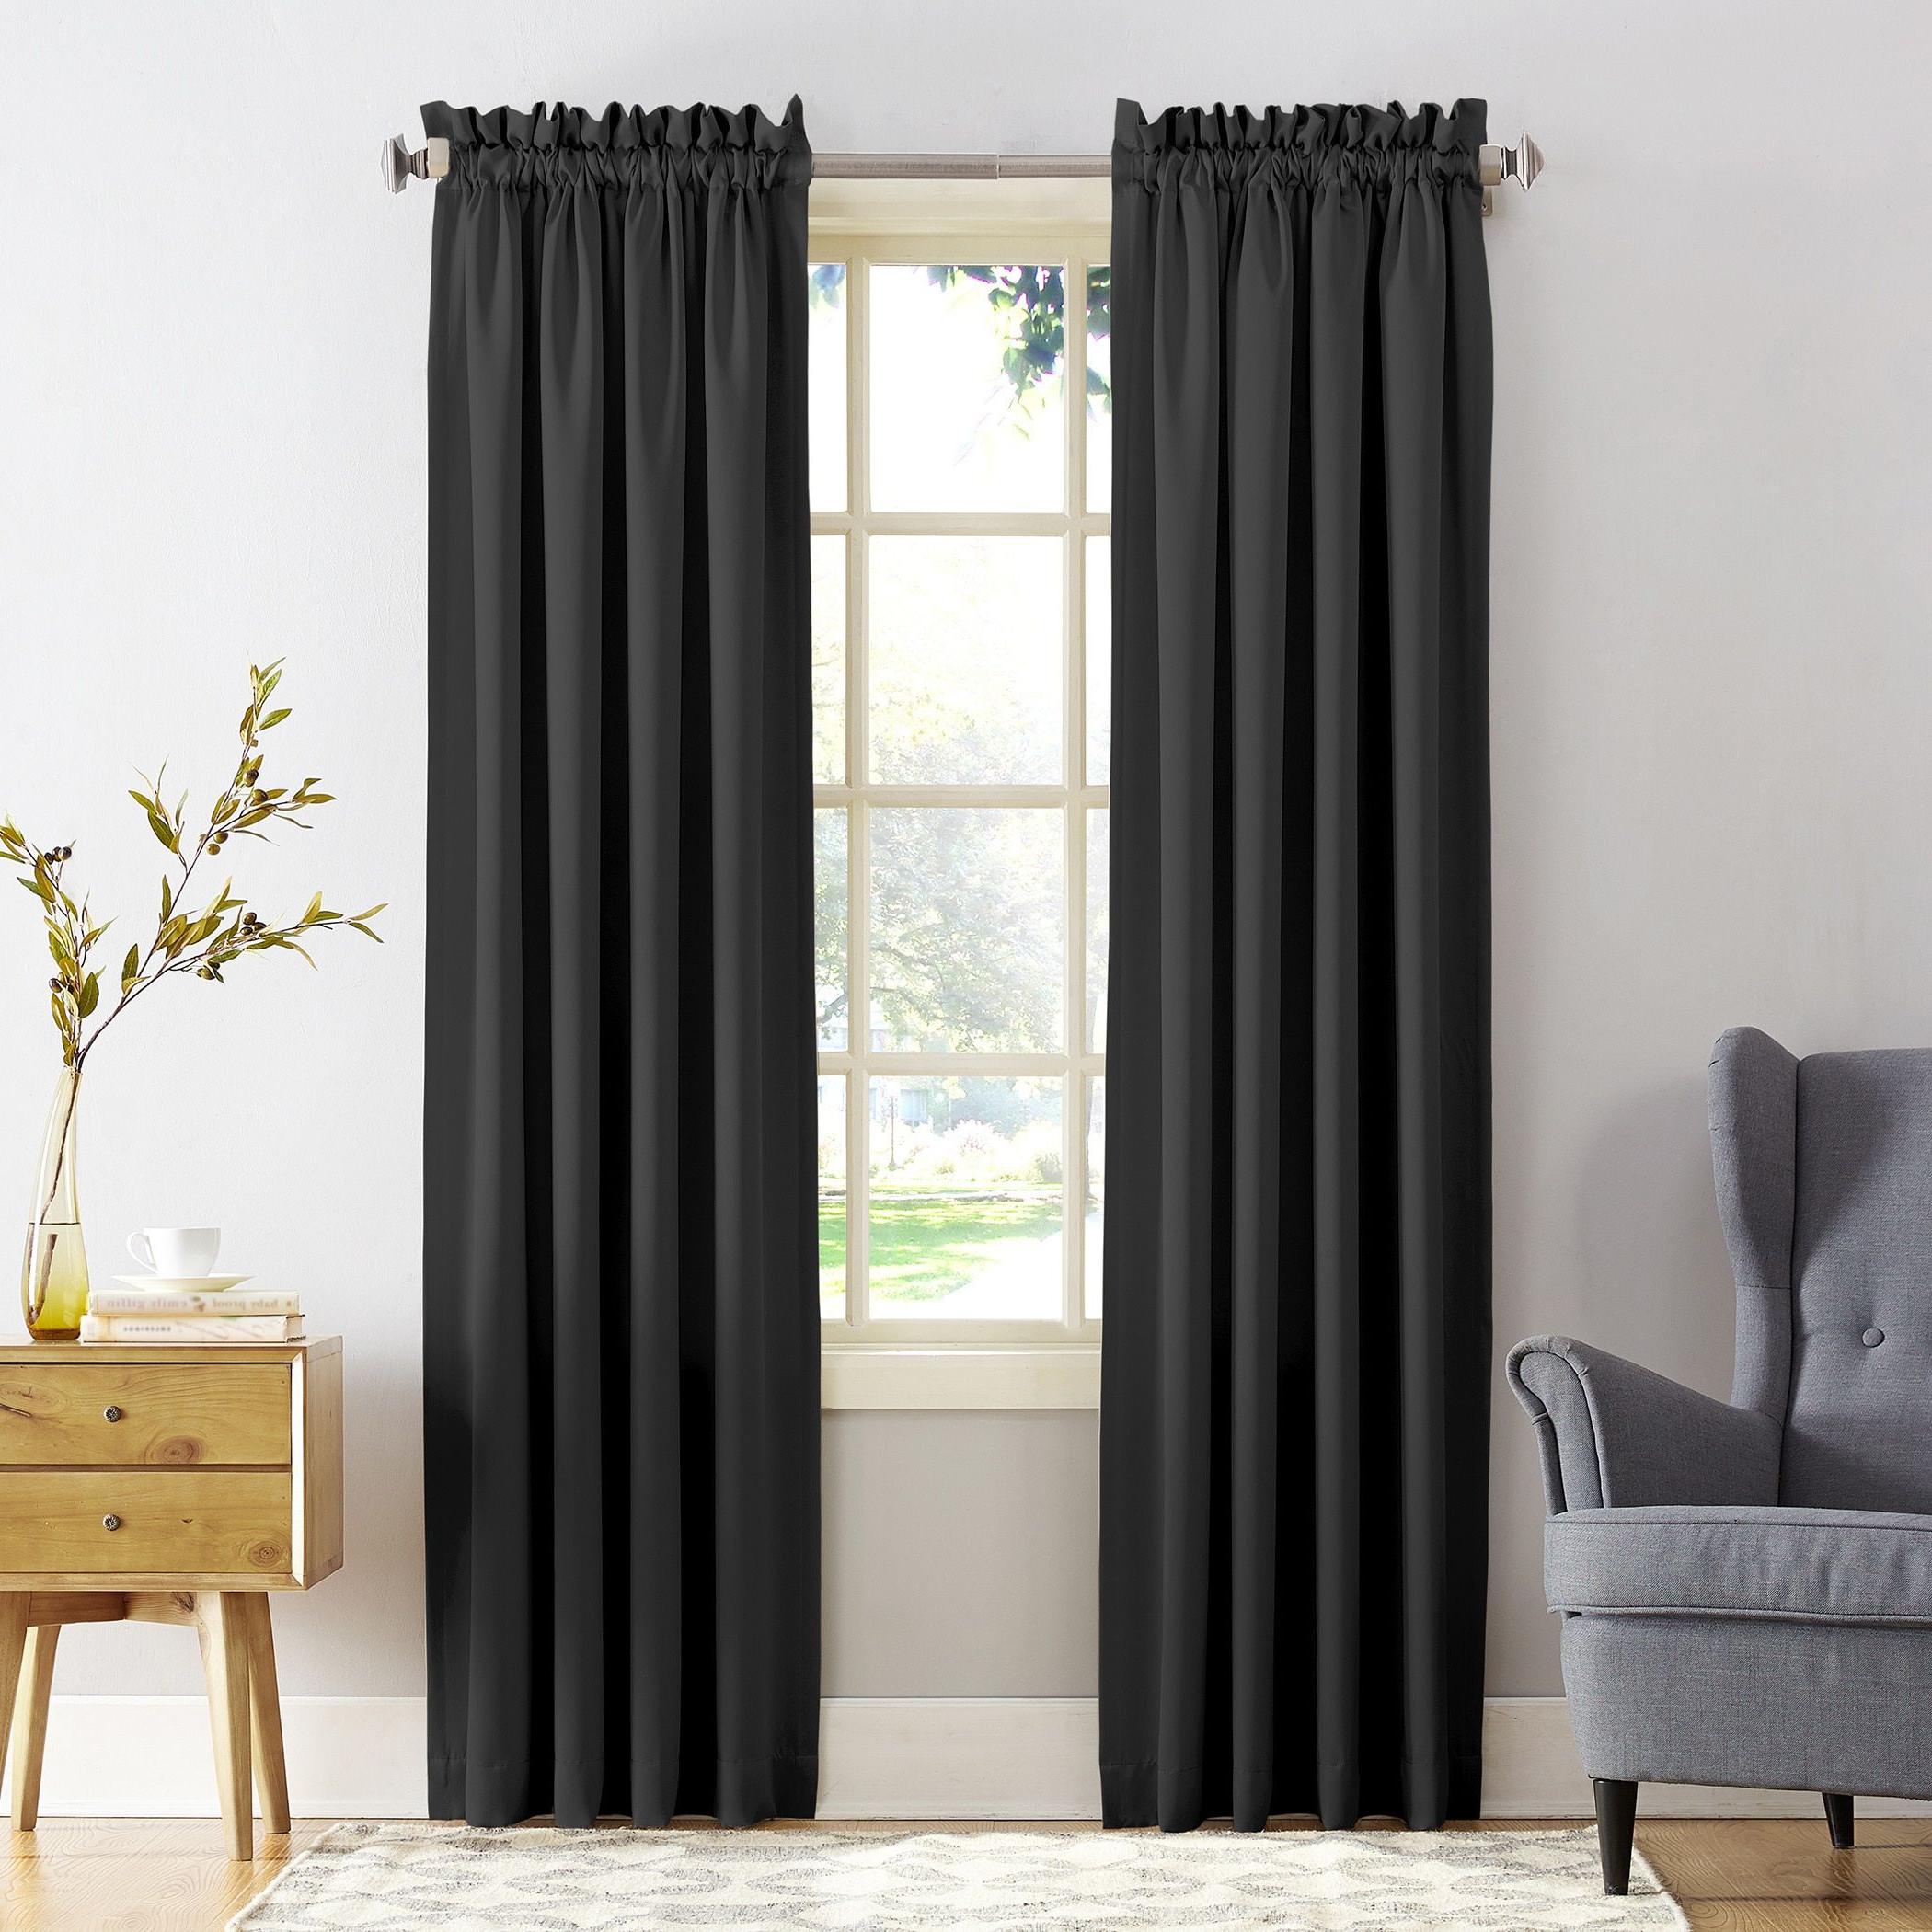 Porch & Den Inez Room Darkening Window Curtain Panel Or Pertaining To Trendy Inez Patio Door Window Curtain Panels (View 3 of 20)